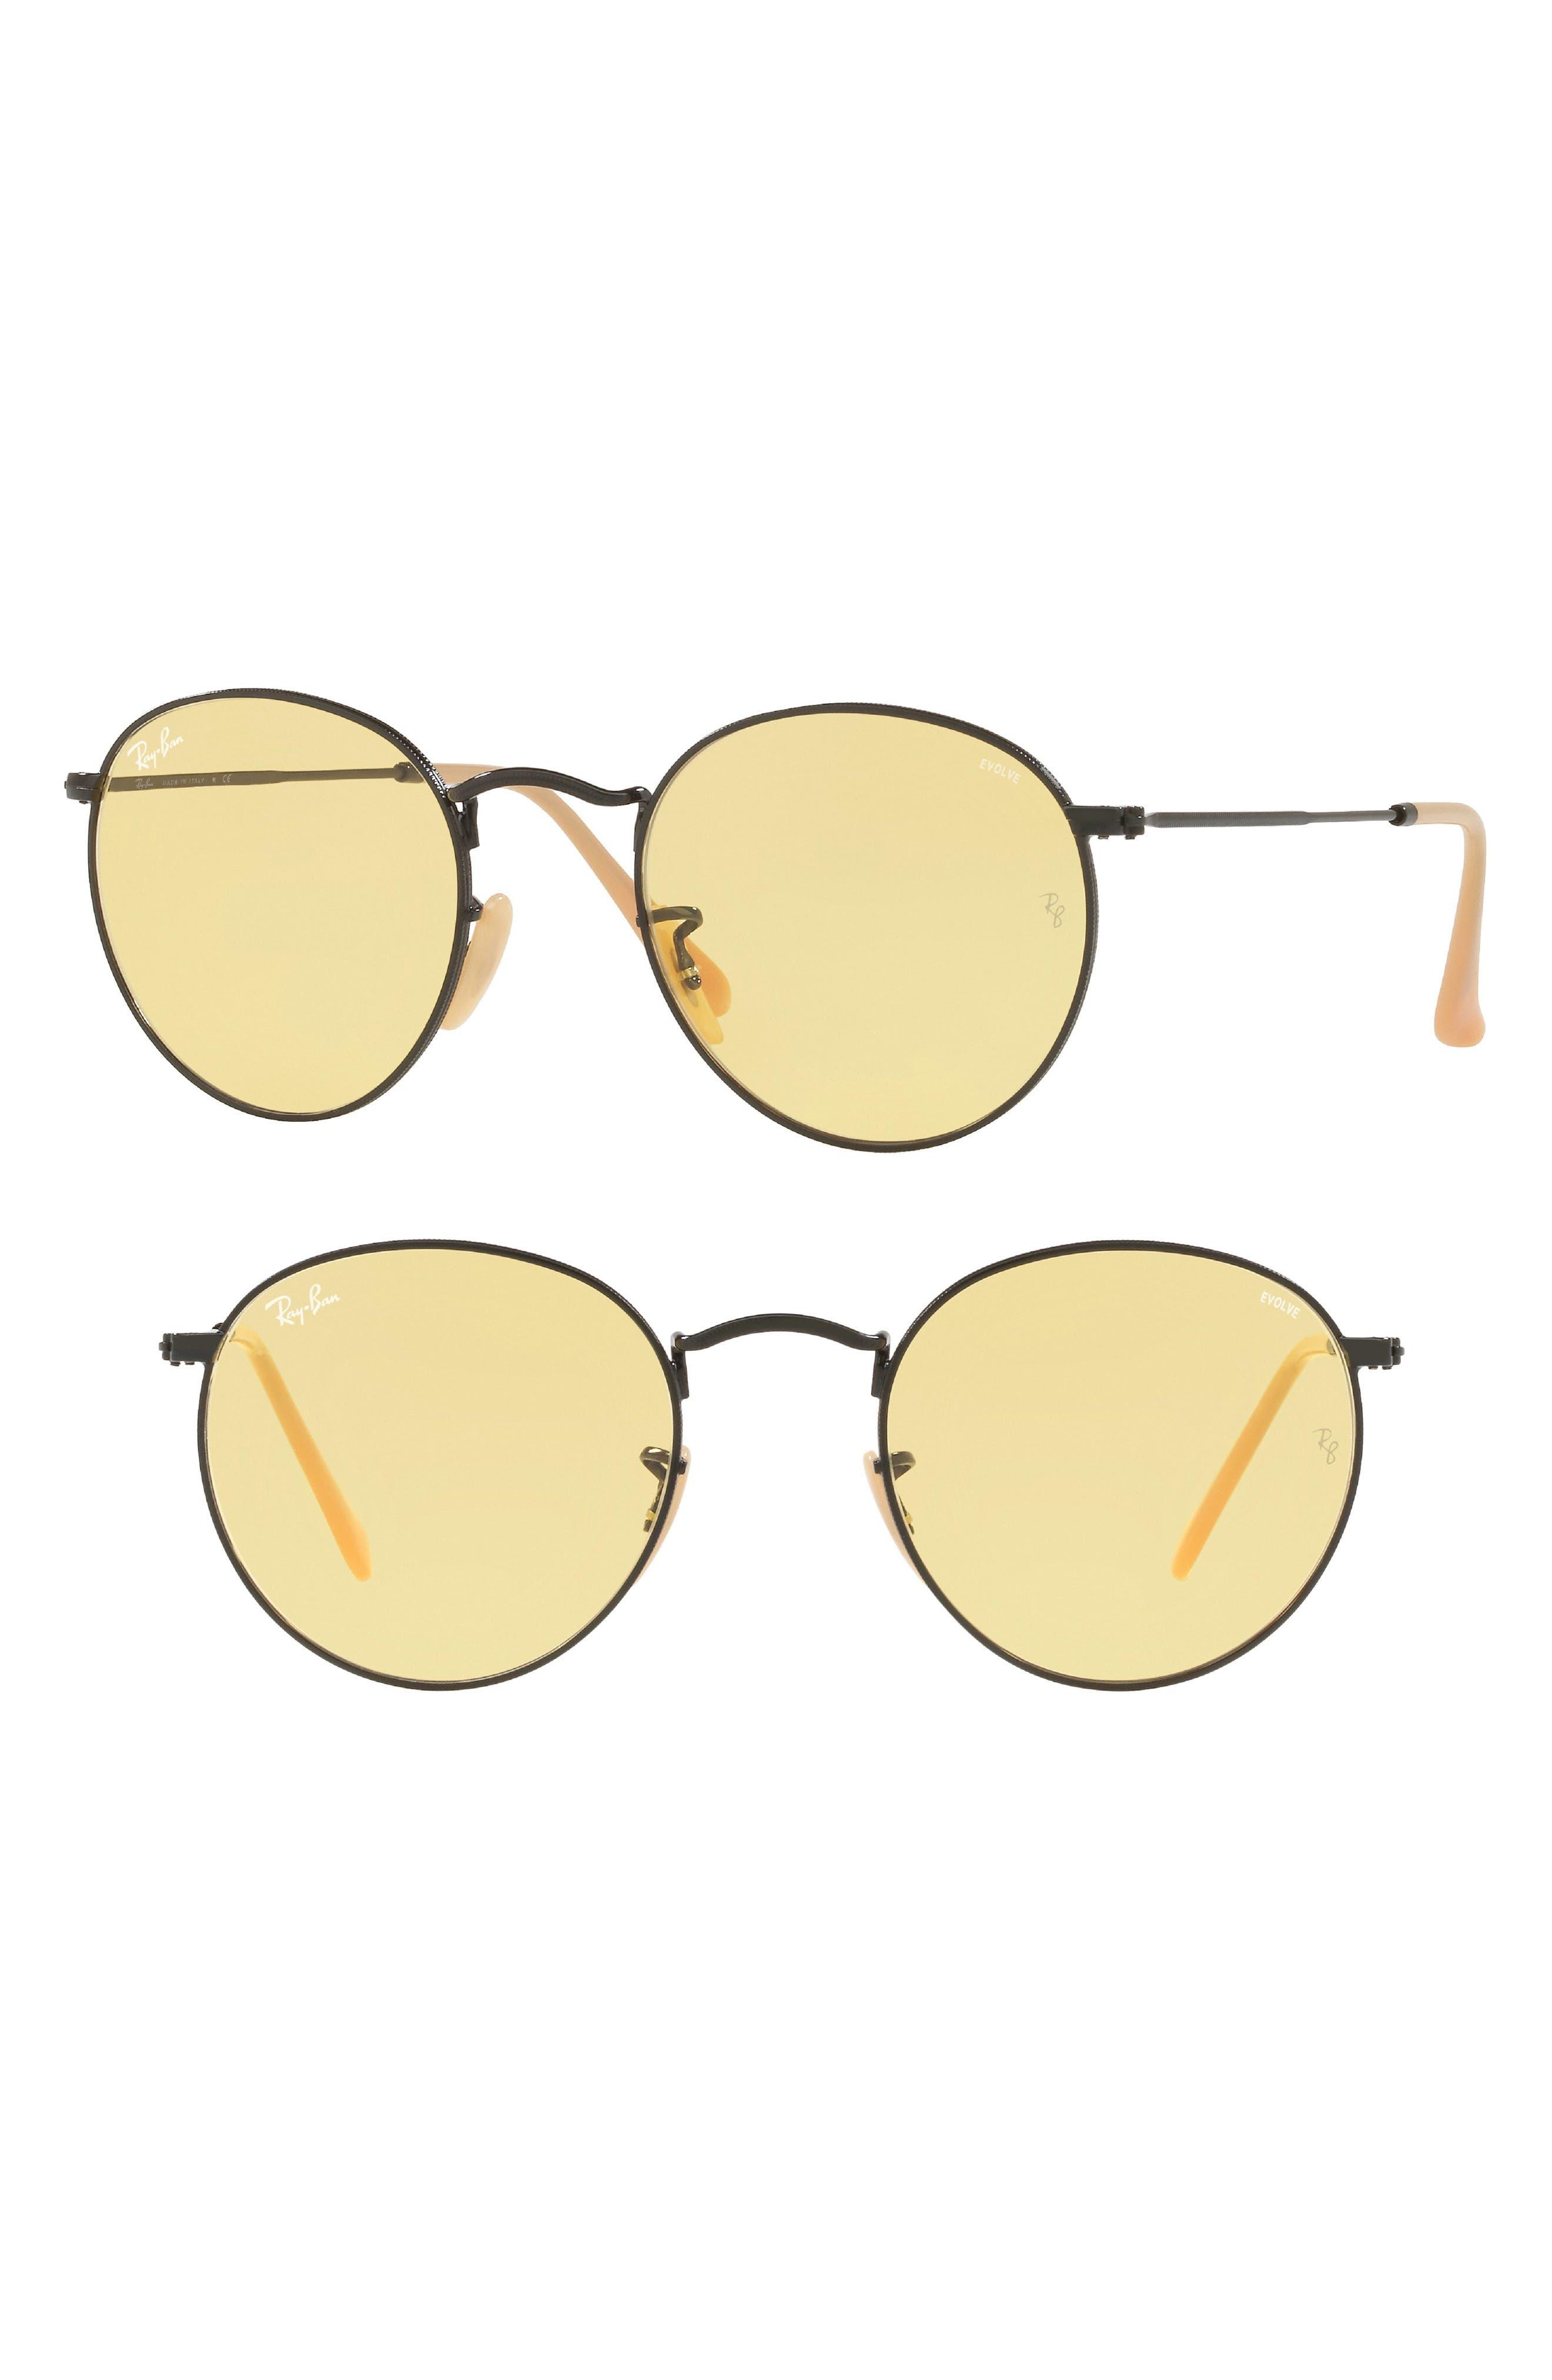 53mm Polarized Round Sunglasses,                             Main thumbnail 1, color,                             016